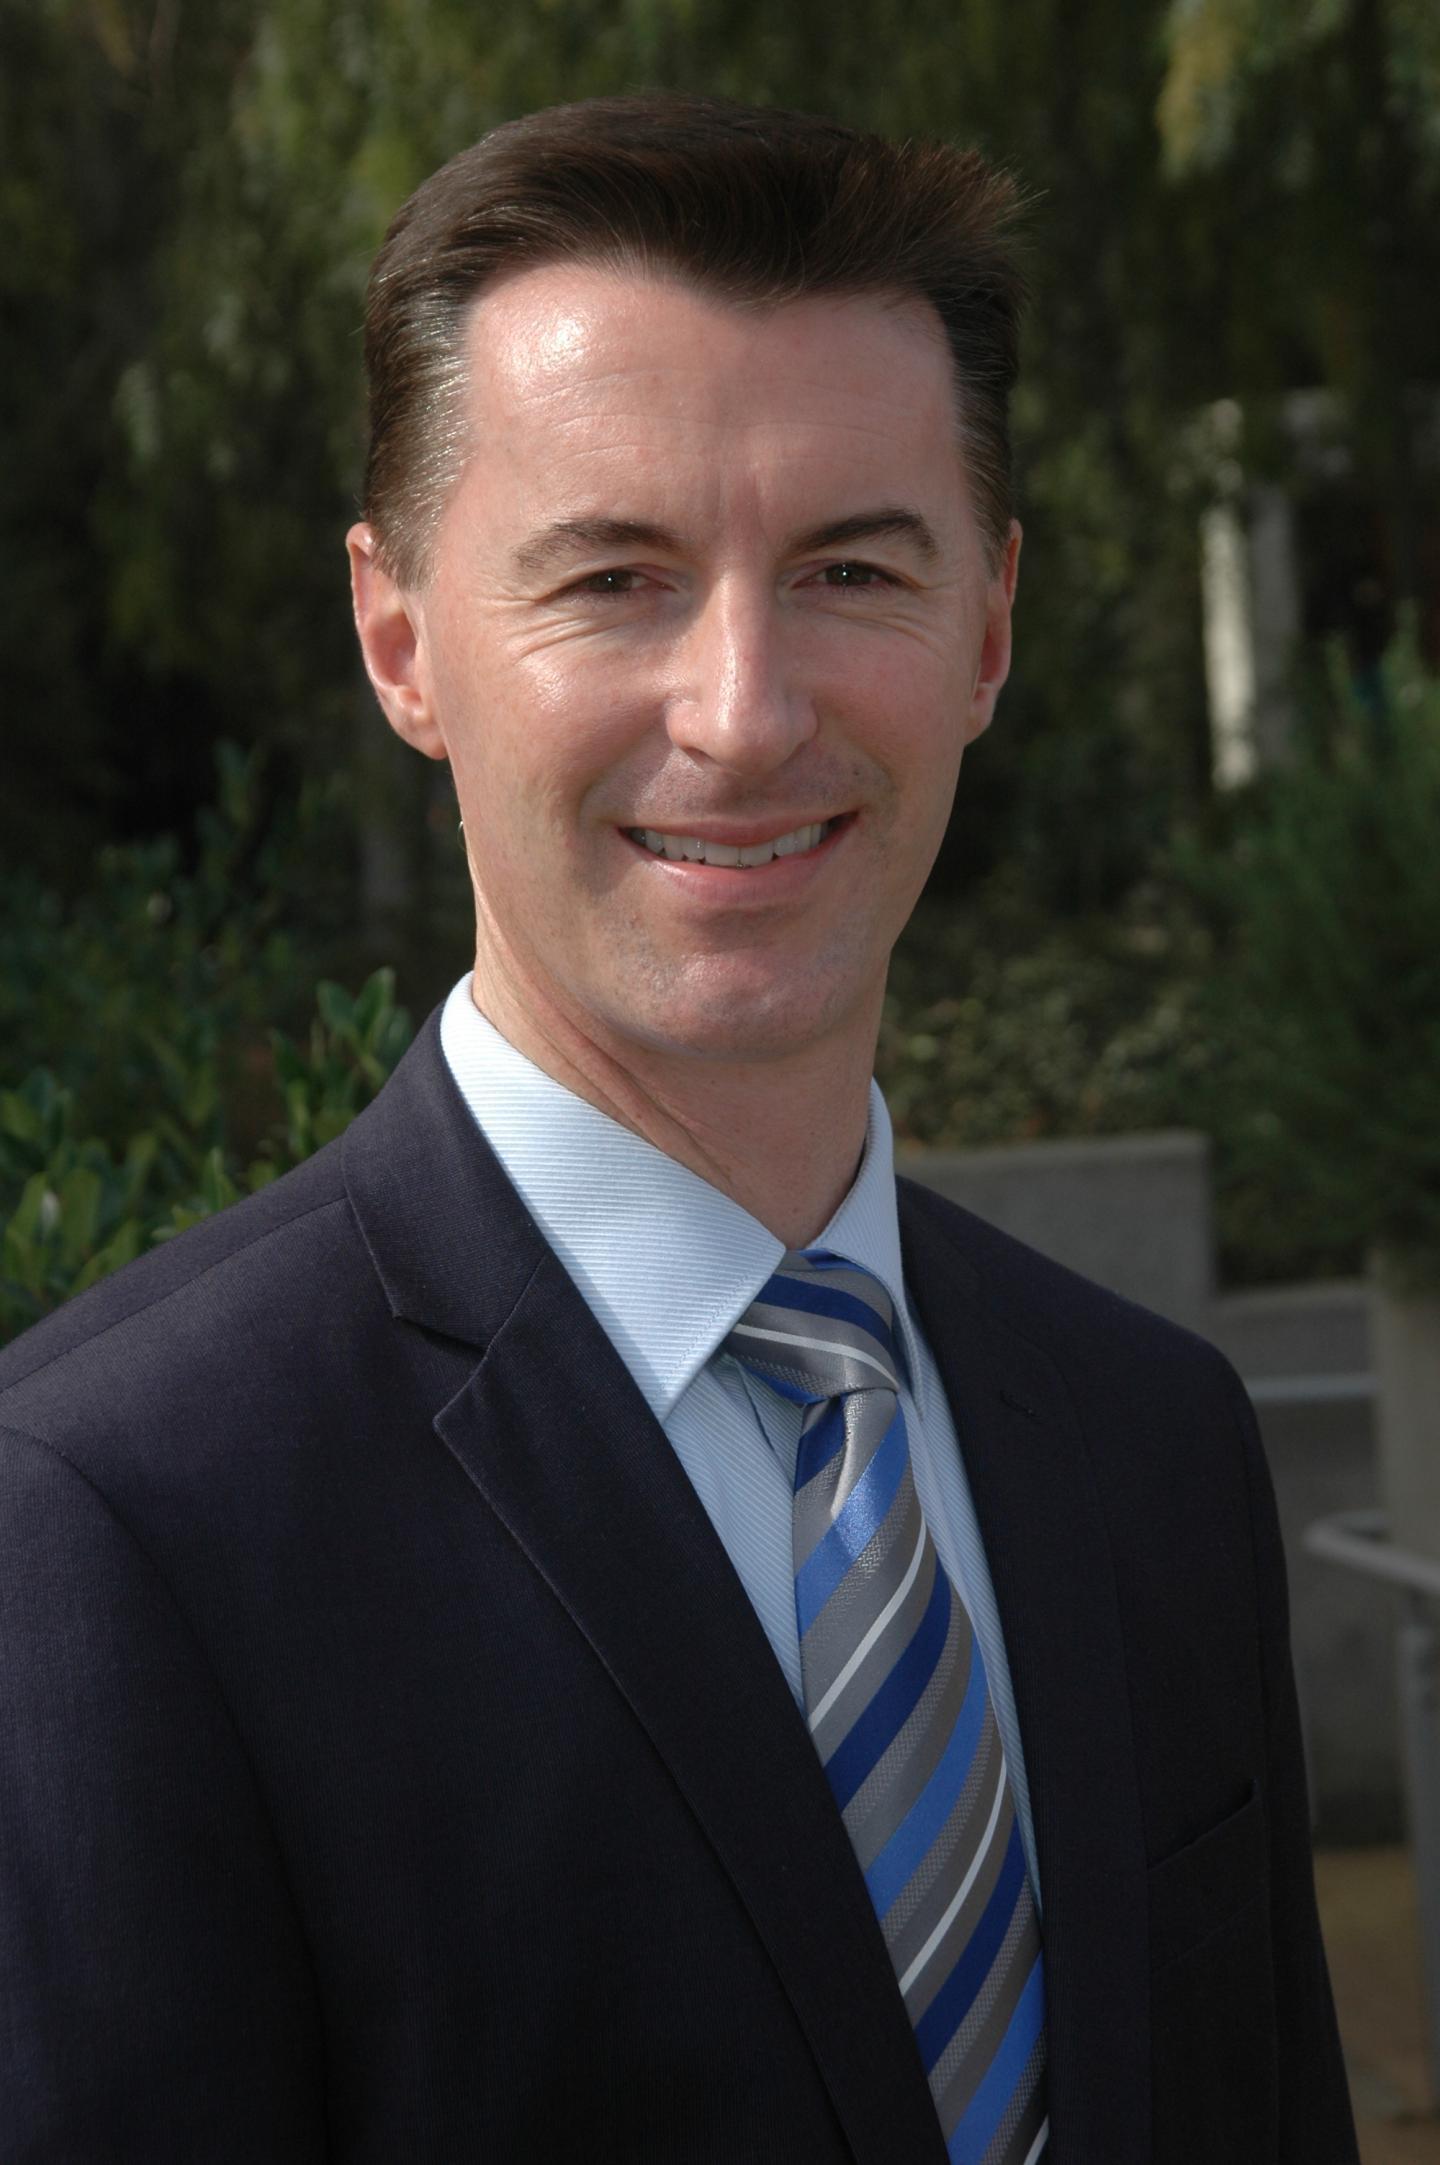 Declan McCole, University of California - Riverside